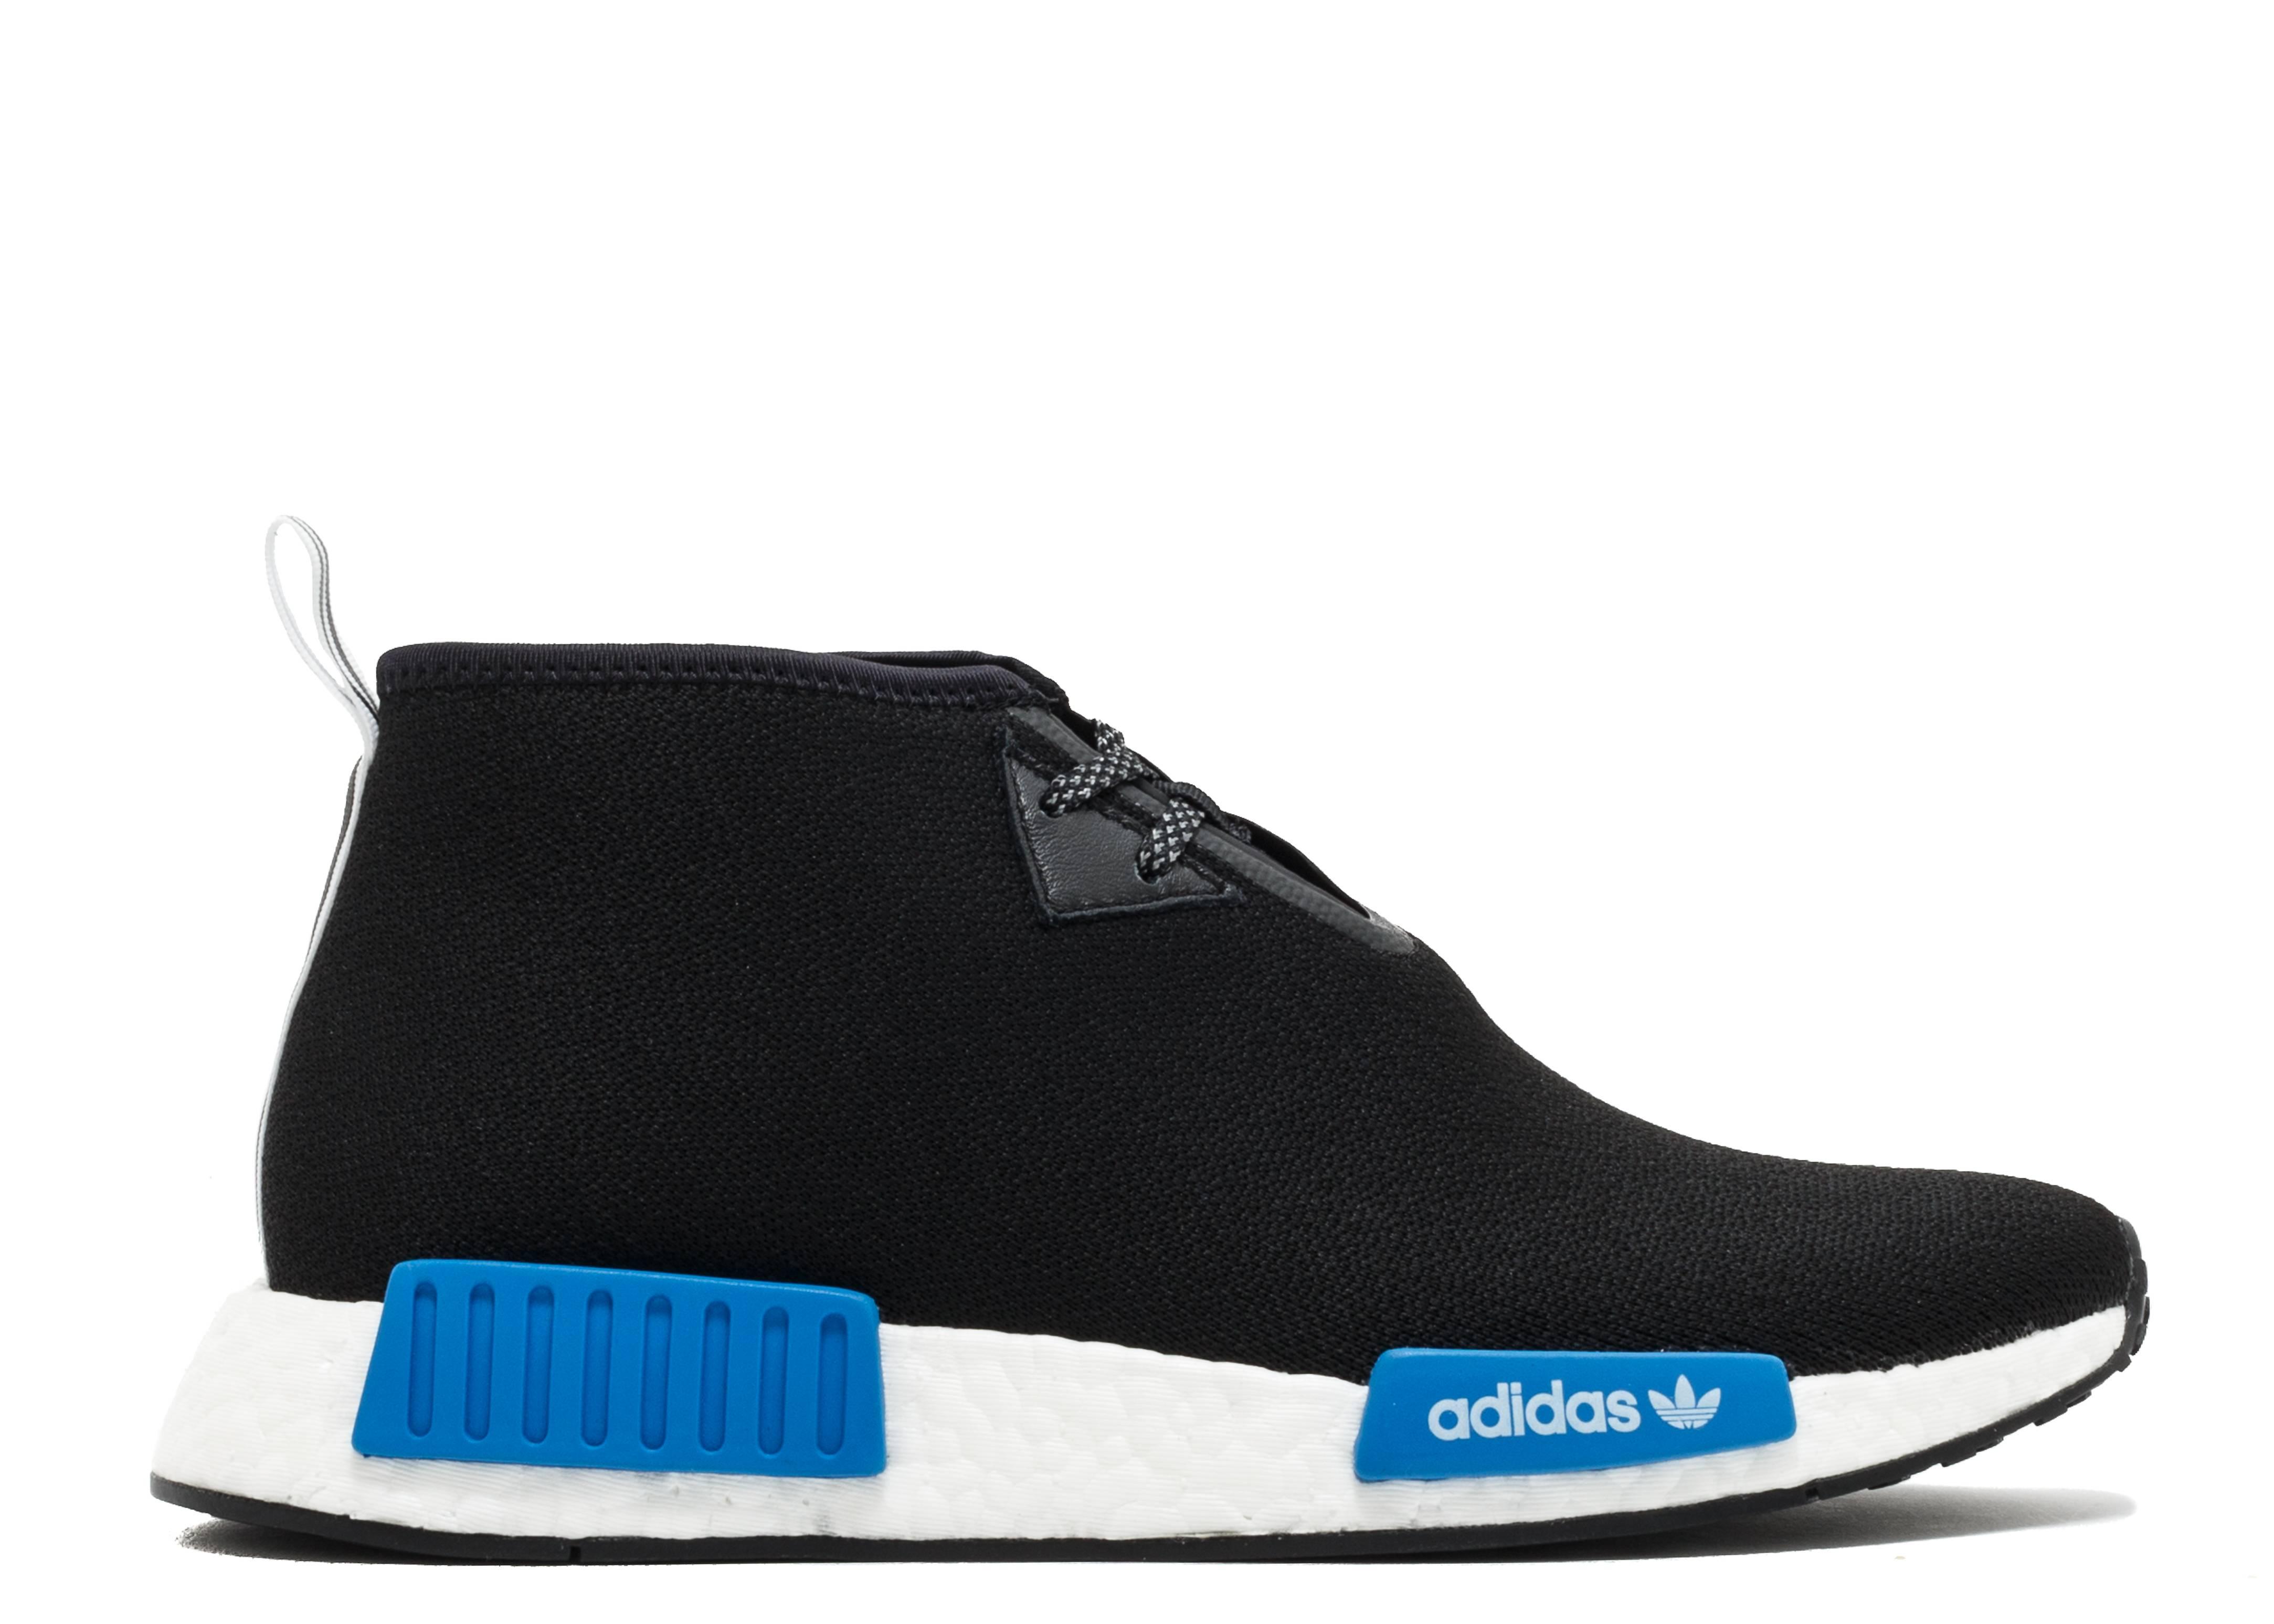 sports shoes 6f9c2 8edf2 adidas. nmd c1 porter